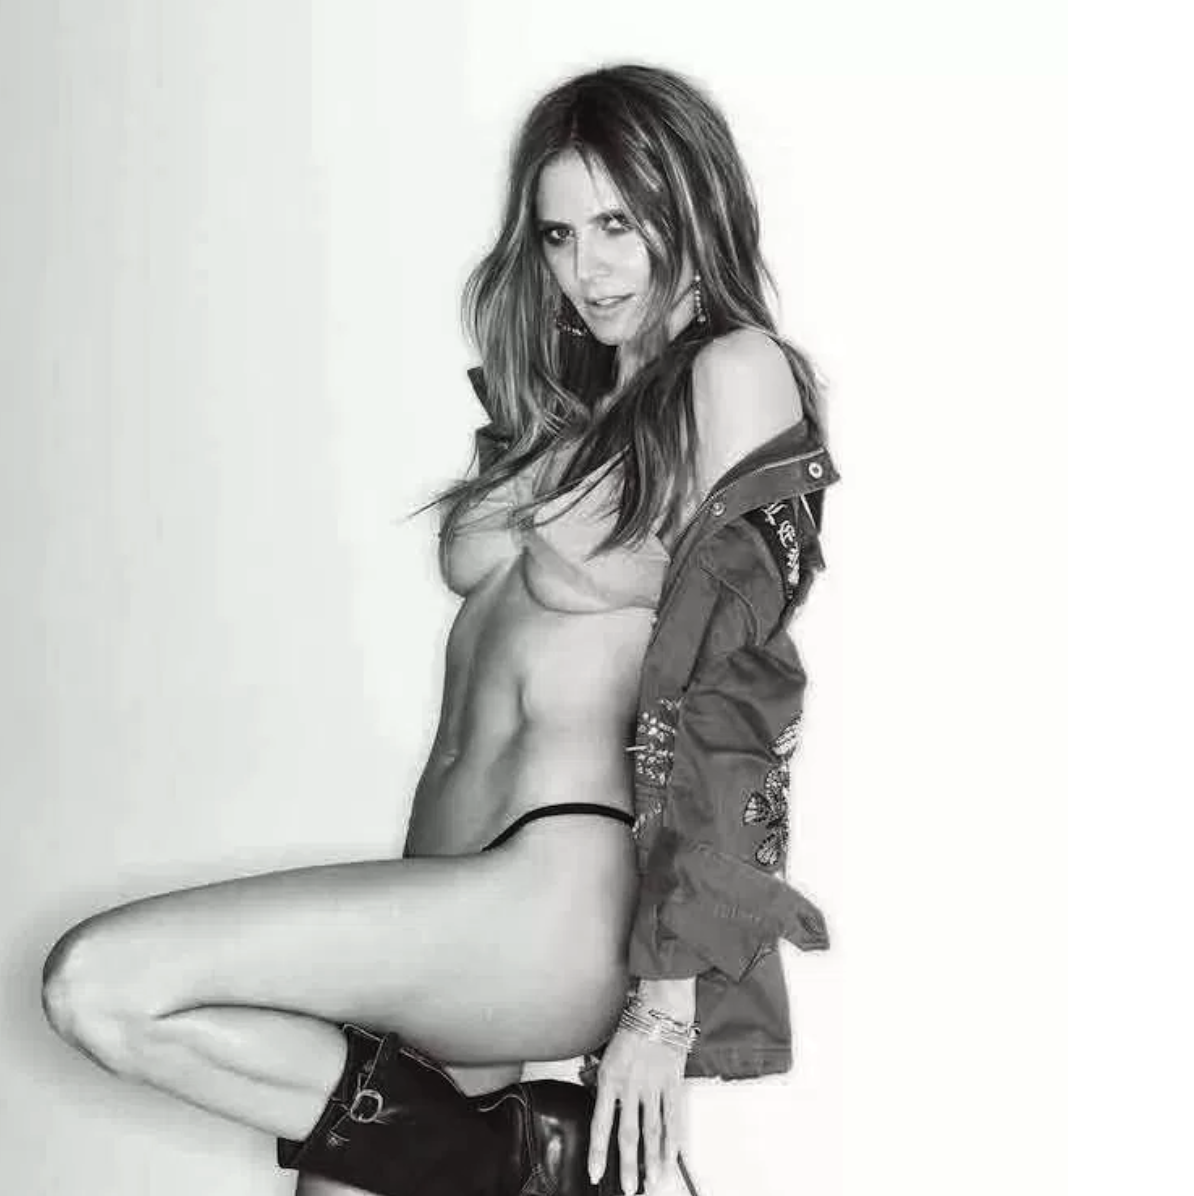 Ageless Heidi Klum Goes Topless for Busty MAXIM Spread [SFW PICS]